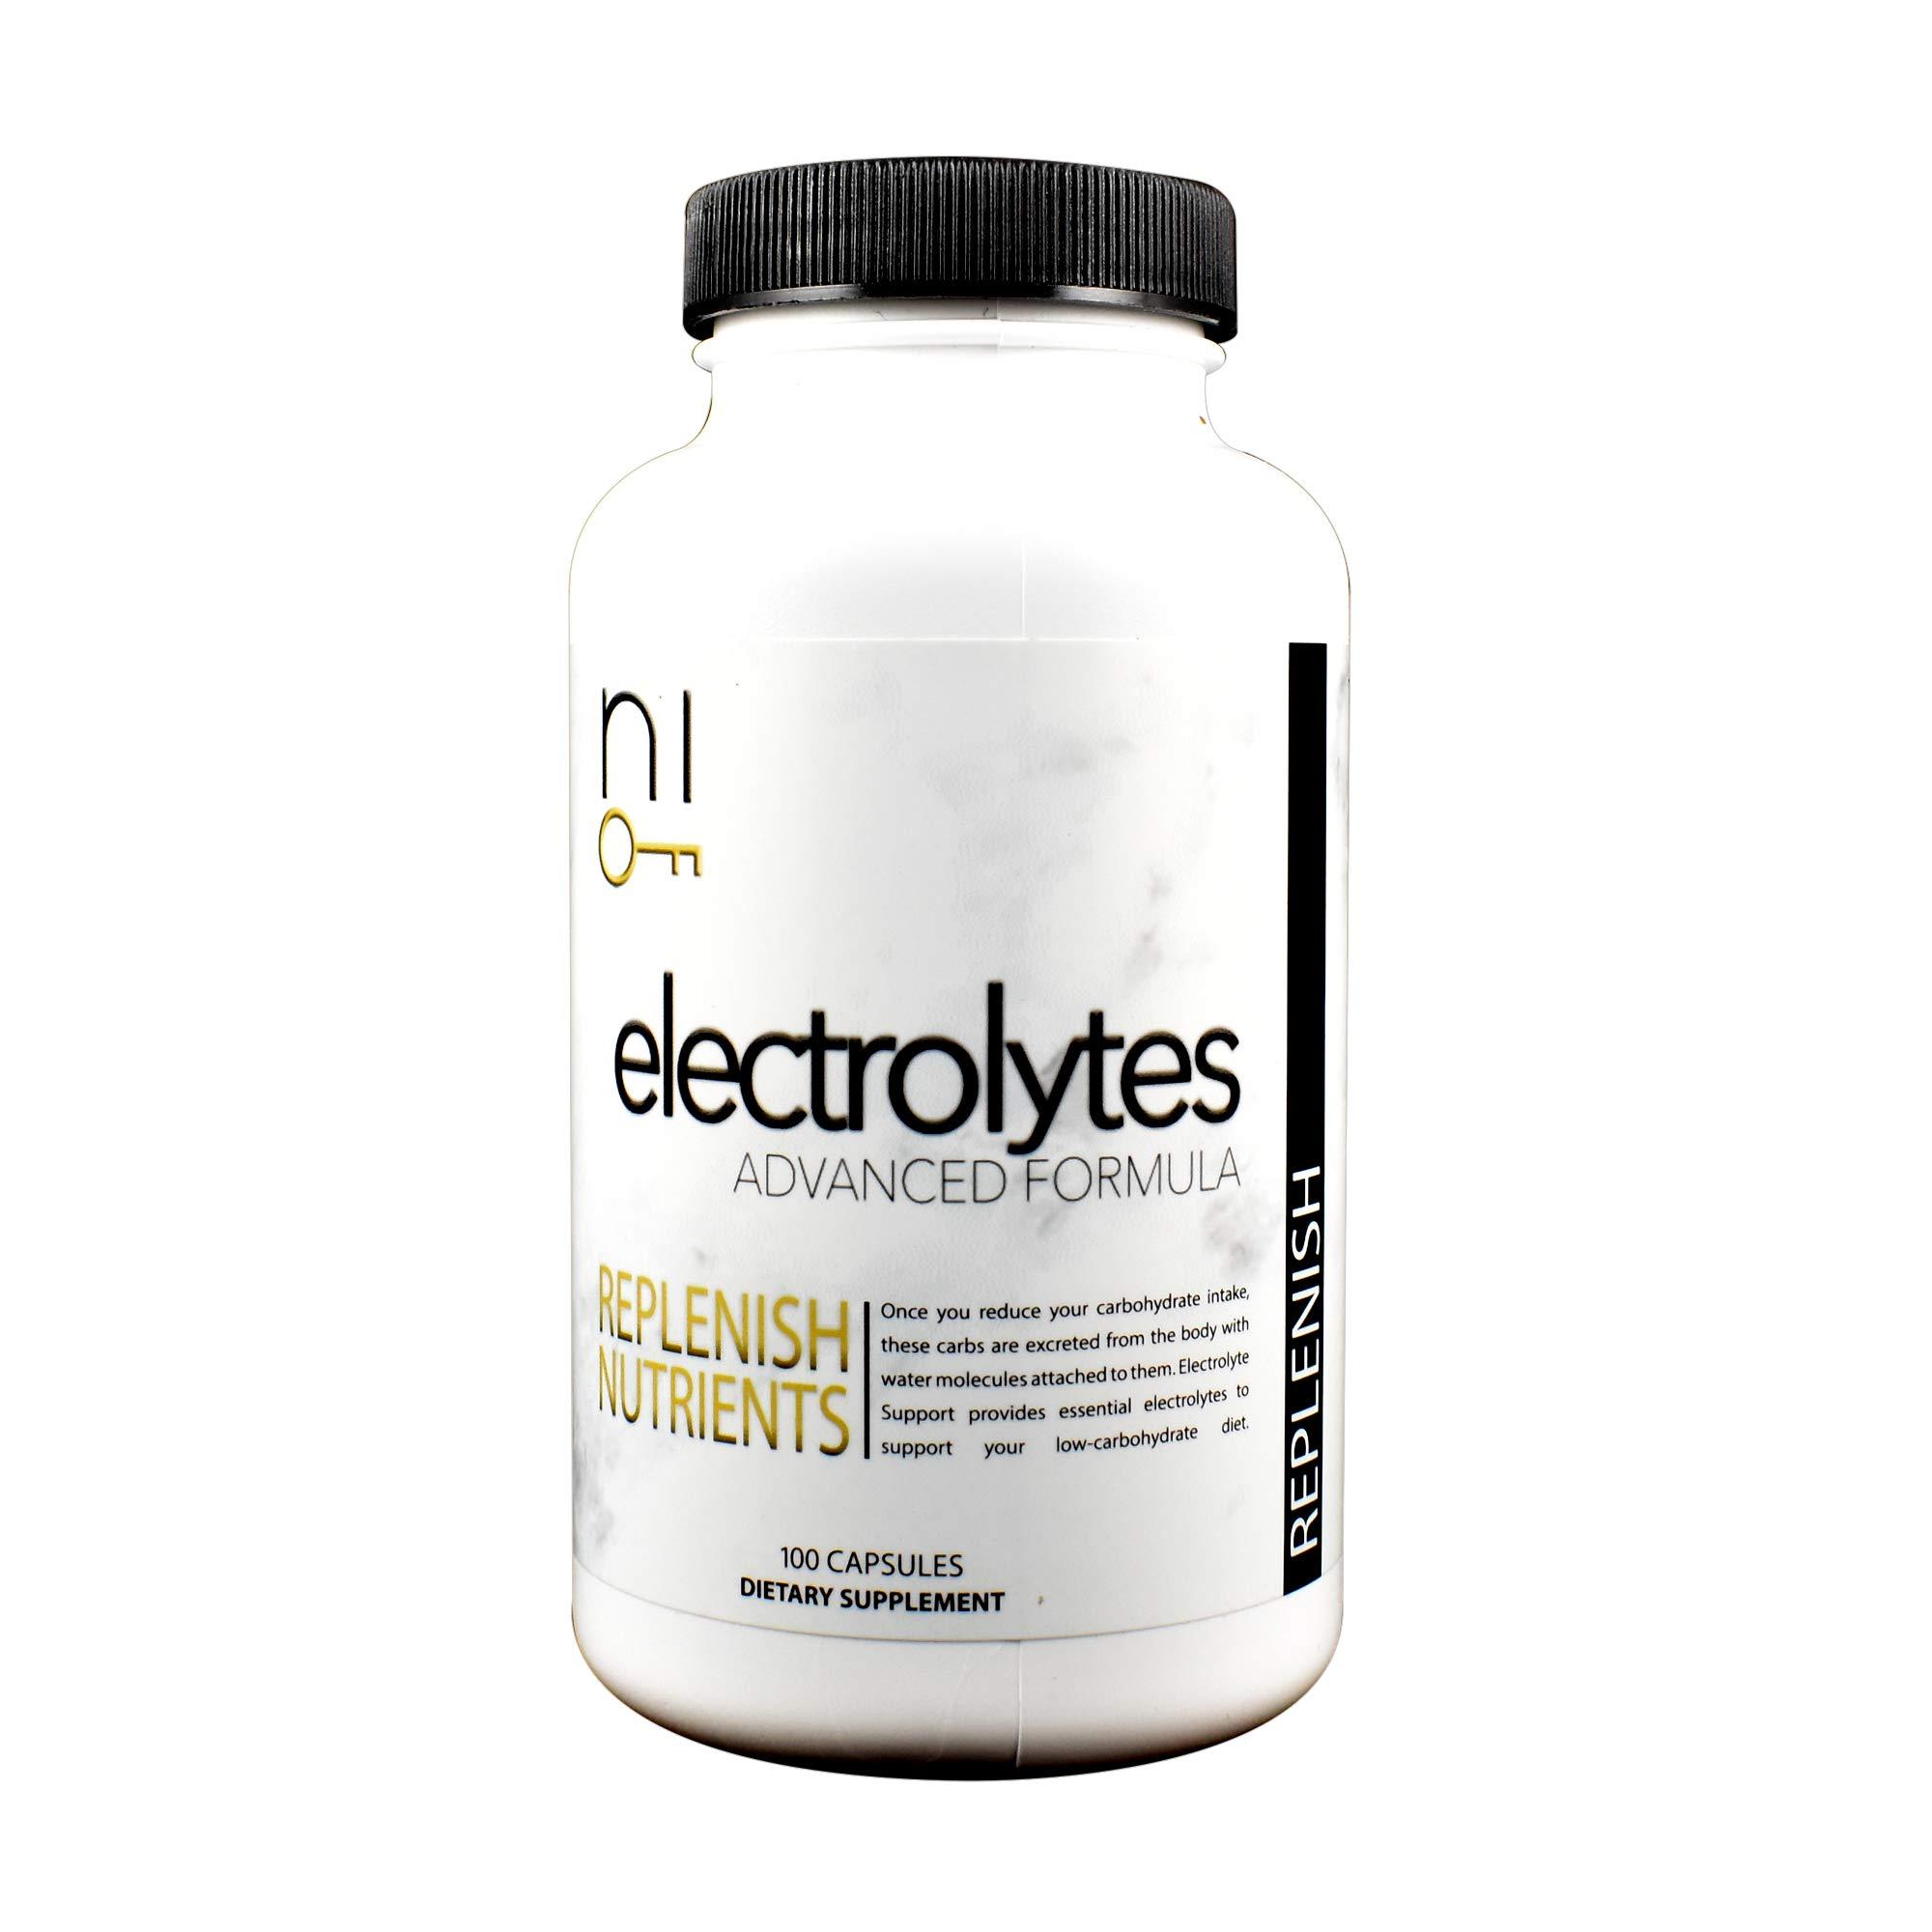 niKETO Replenish (Electrolyte Support) - Replenish Nutrients - Eliminate''Keto Flu''